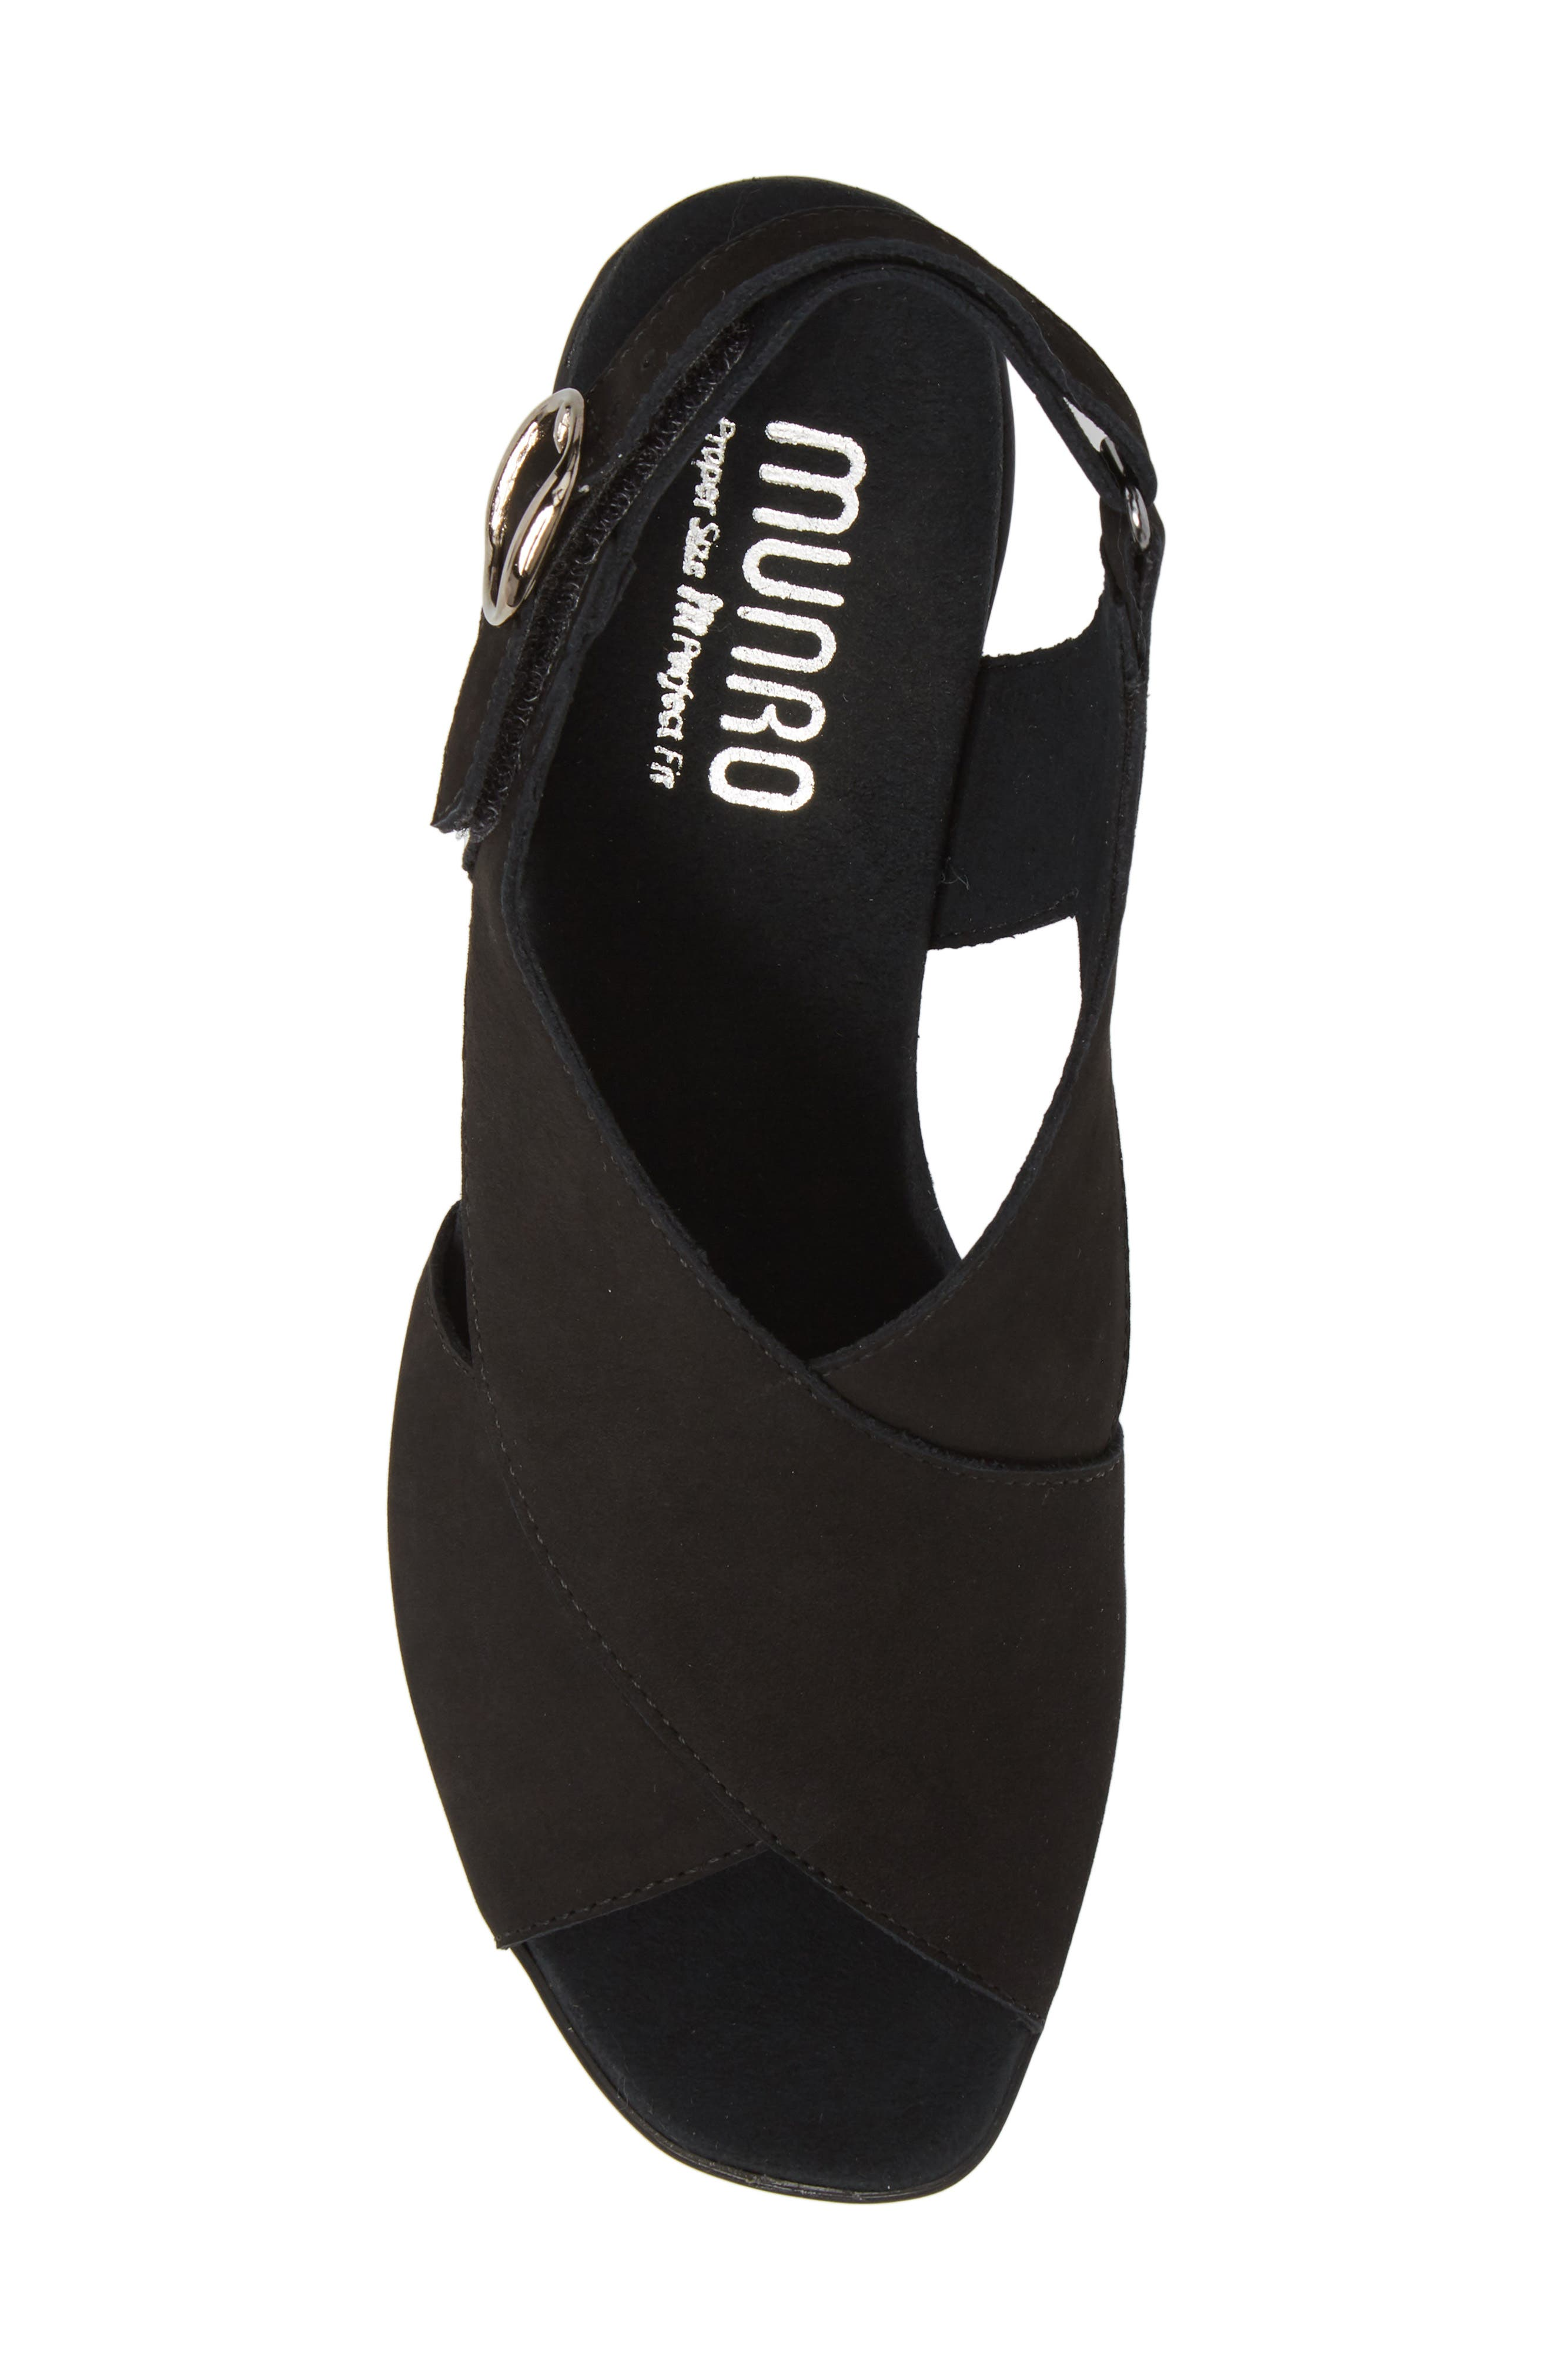 Laine Block Heel Sandal,                             Alternate thumbnail 5, color,                             BLACK NUBUCK LEATHER